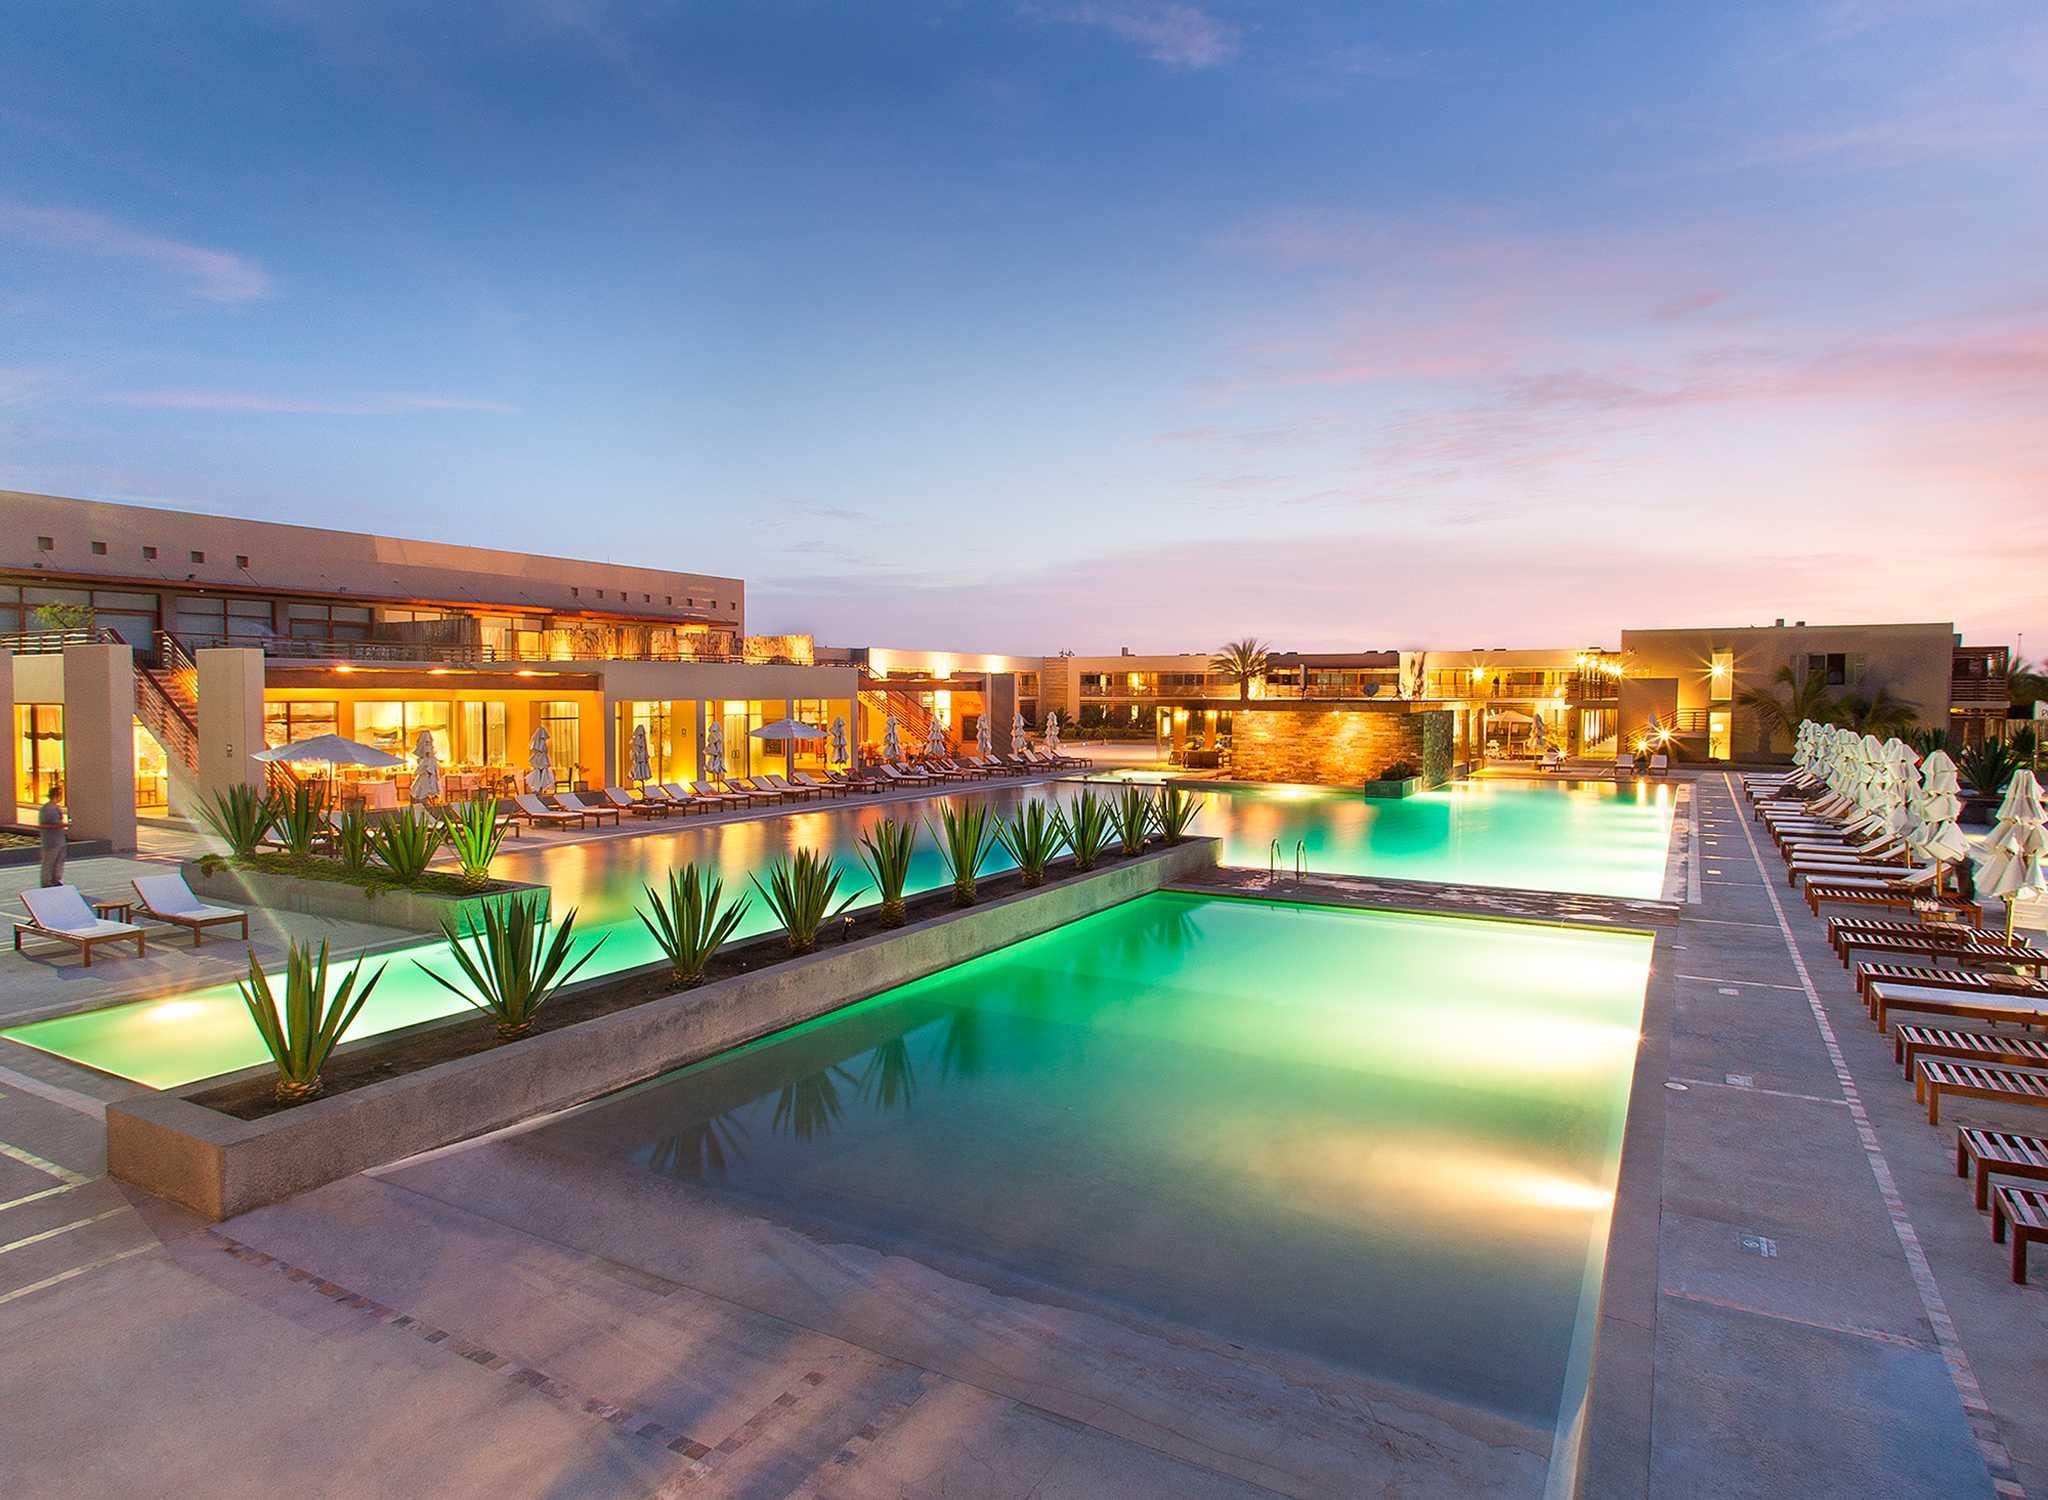 Hotel en per lima paracas hilton for Hoteles en paracas